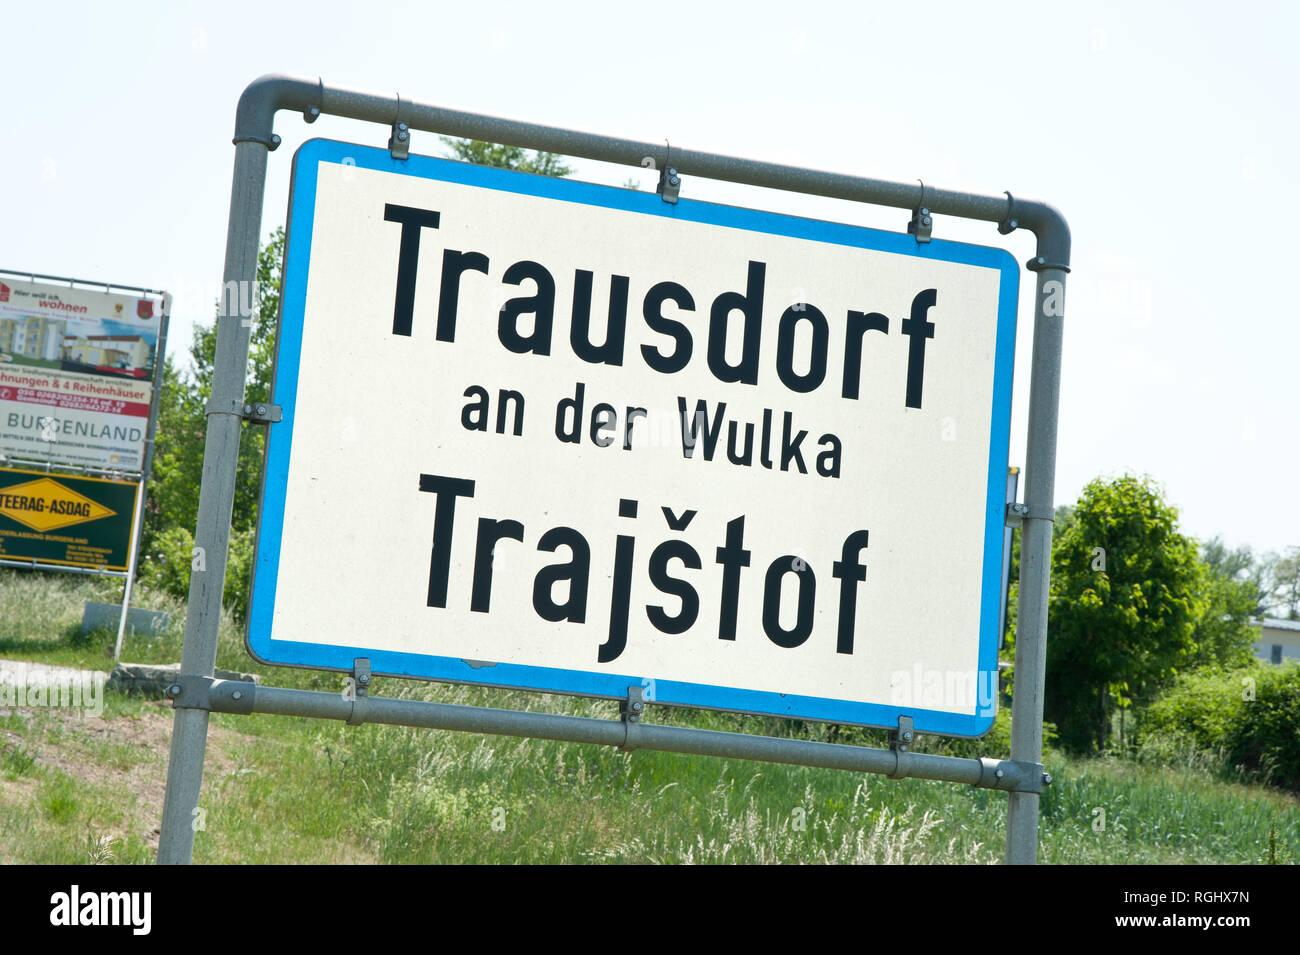 Single Mann - Mischaa aus Trausdorf an der Wulka - Flirtstar